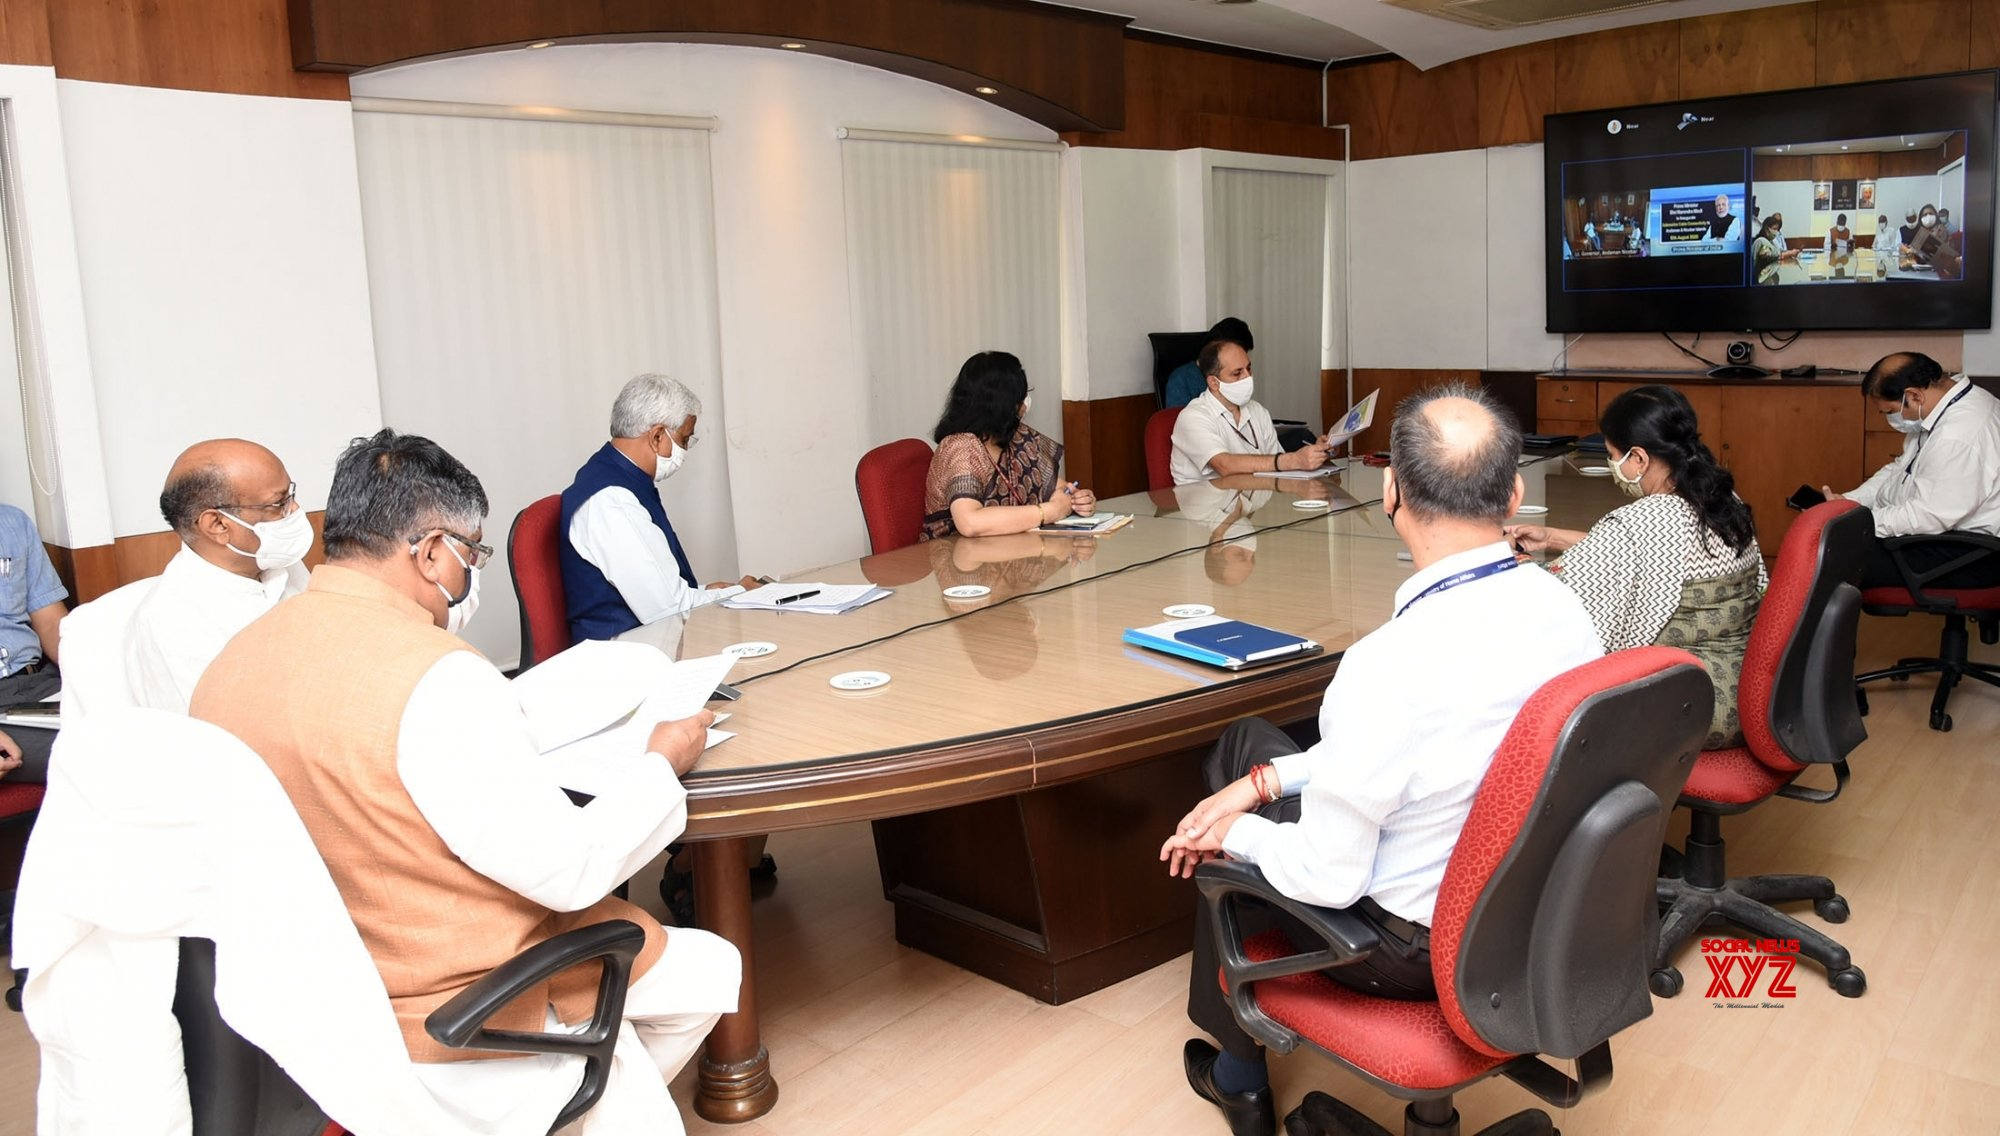 New Delhi: Ravi Shankar Prasad at the launch submarine cable connectivity to Andaman & Nicobar Islands #Gallery